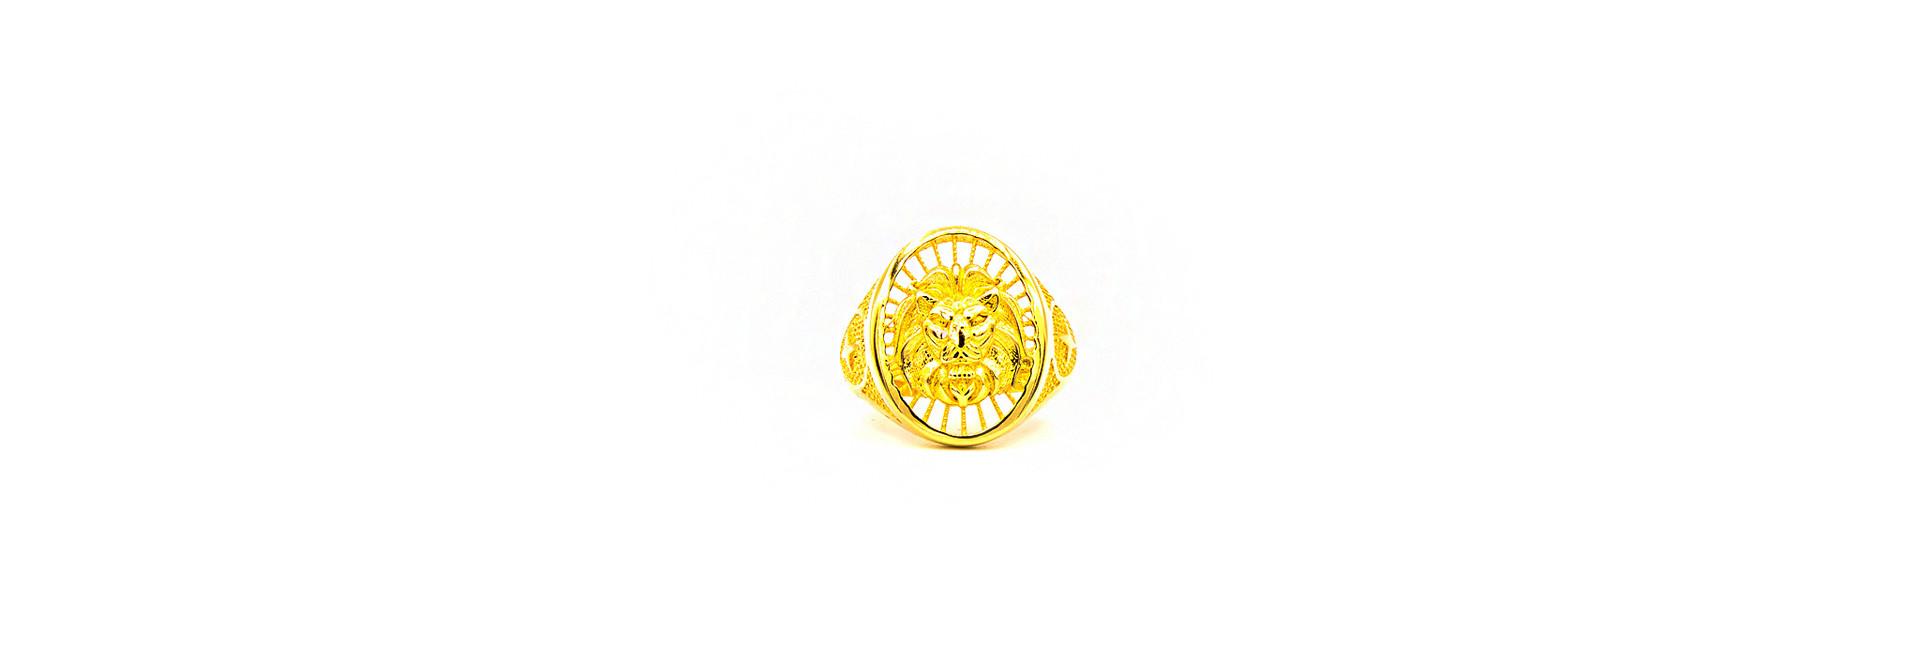 Ring opengewerkte leeuwenkop